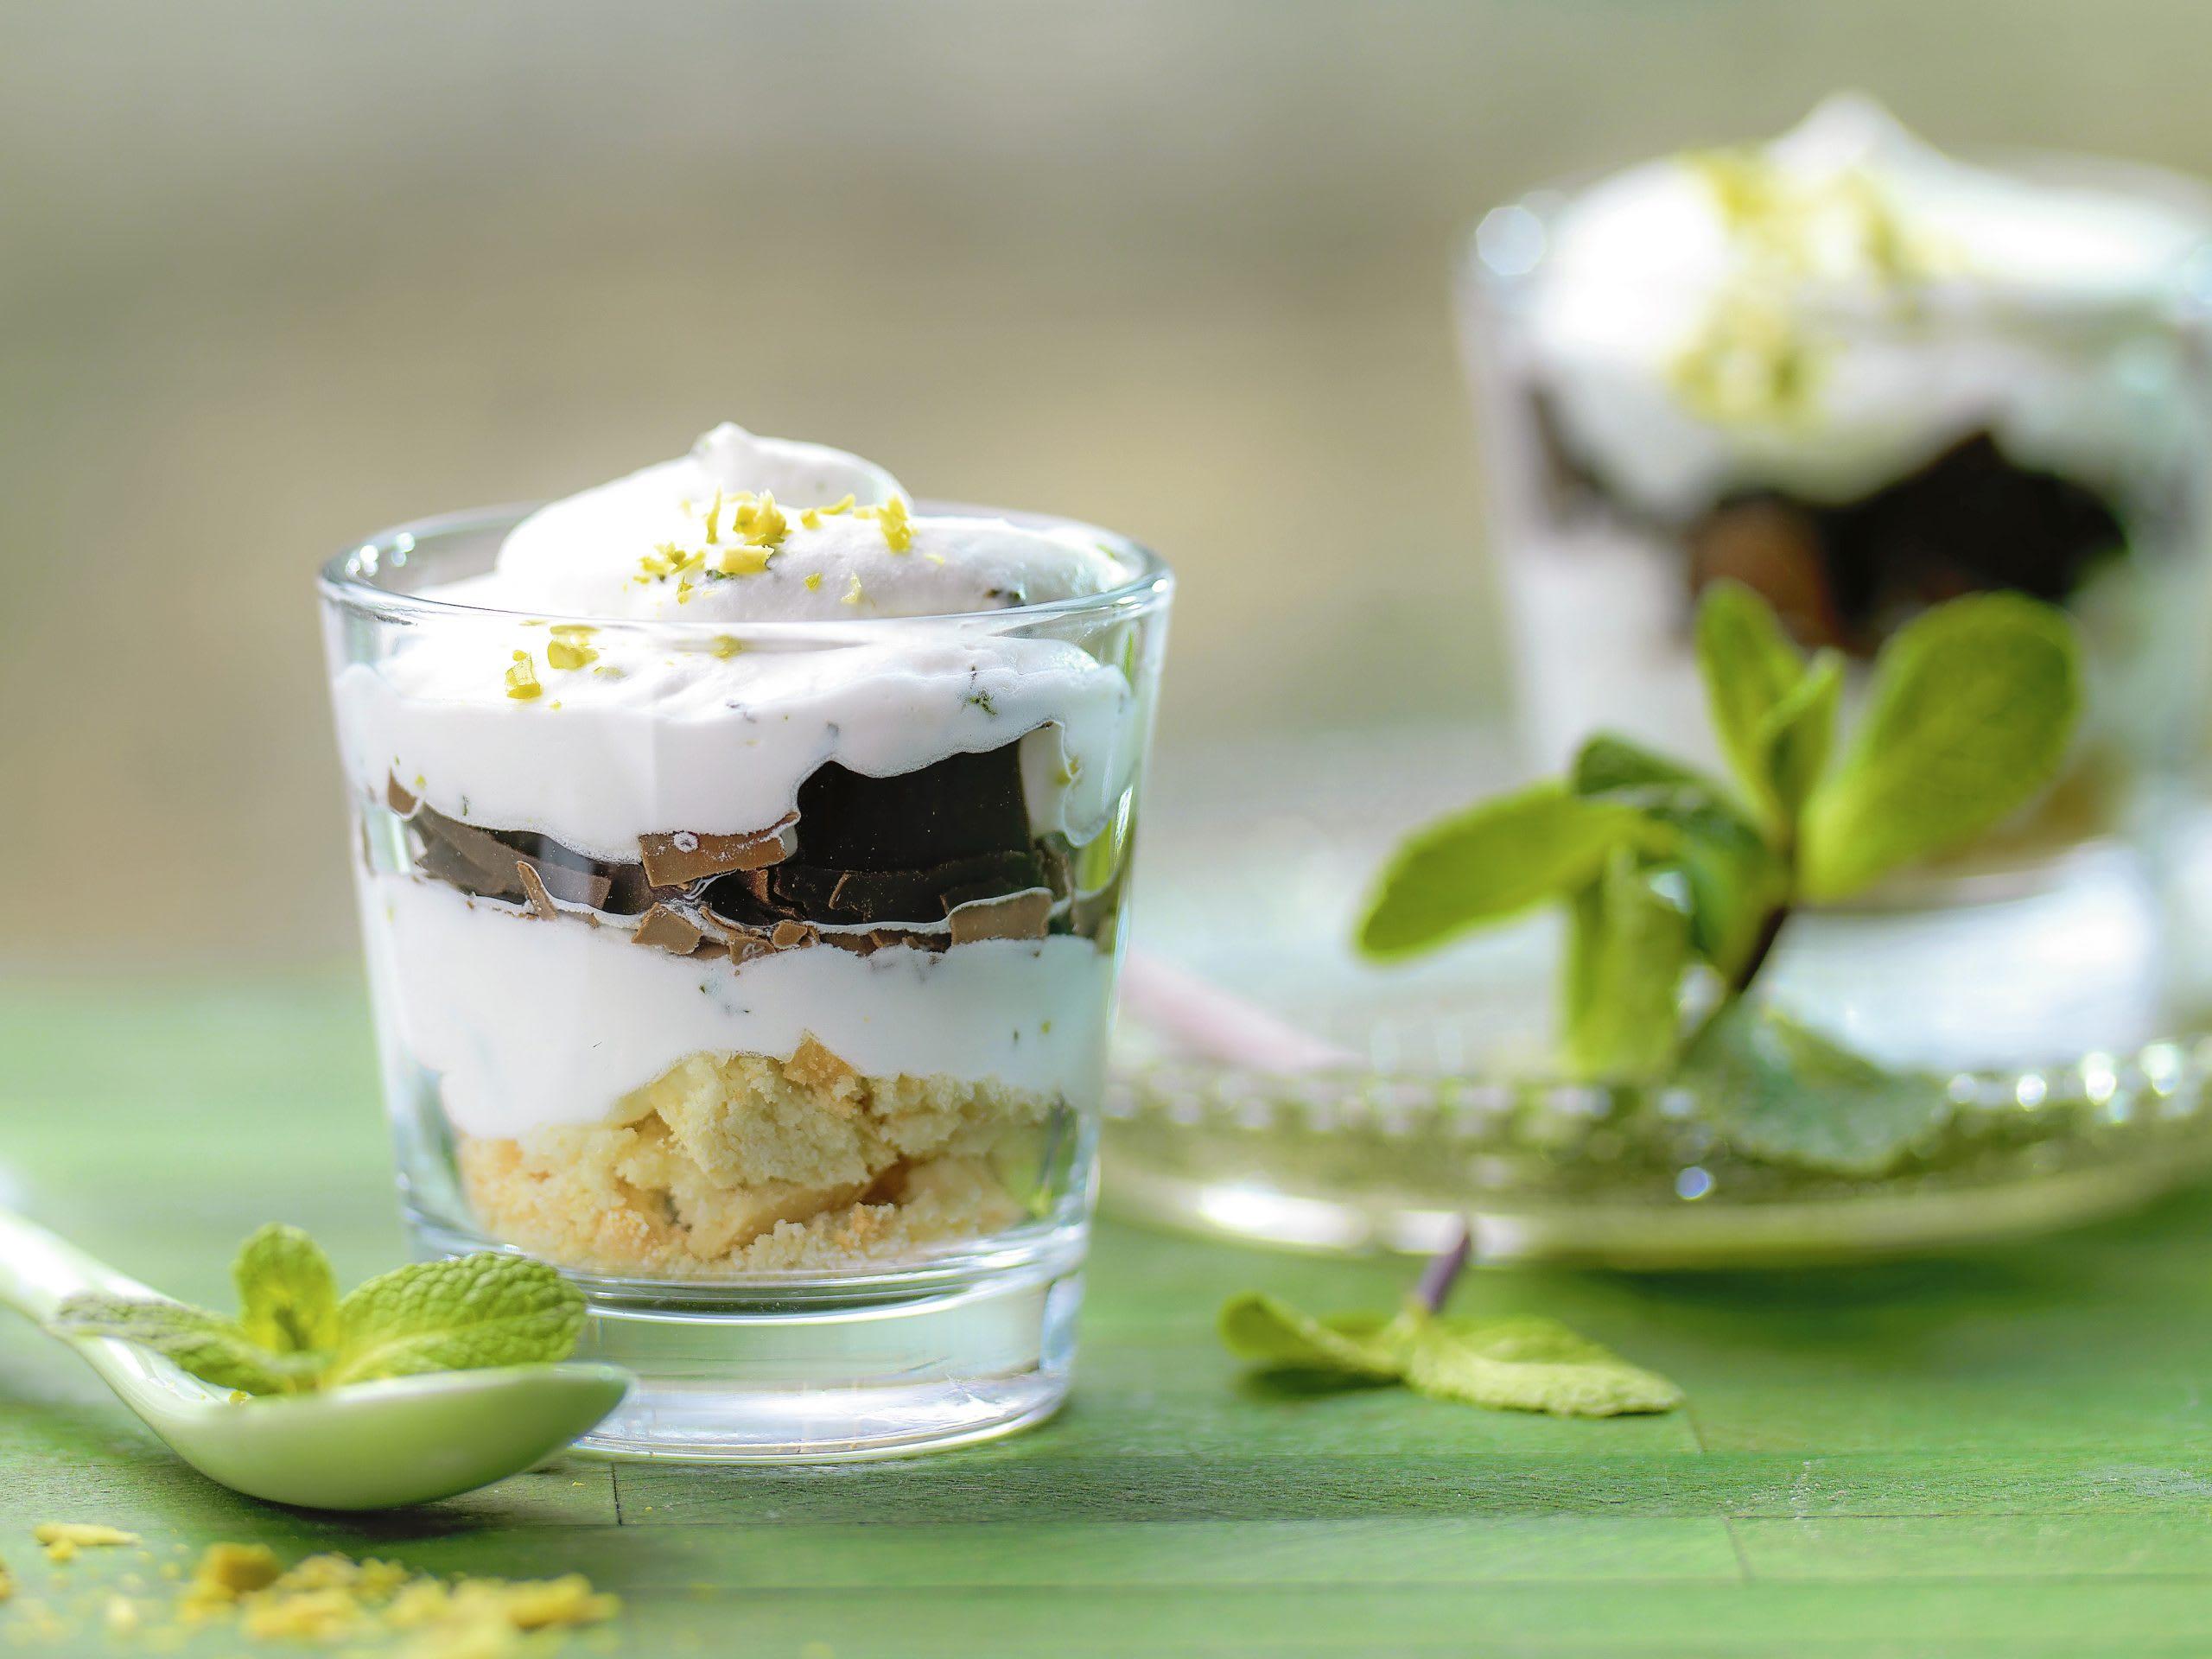 Pfefferminz-Schokoladen-Trifle